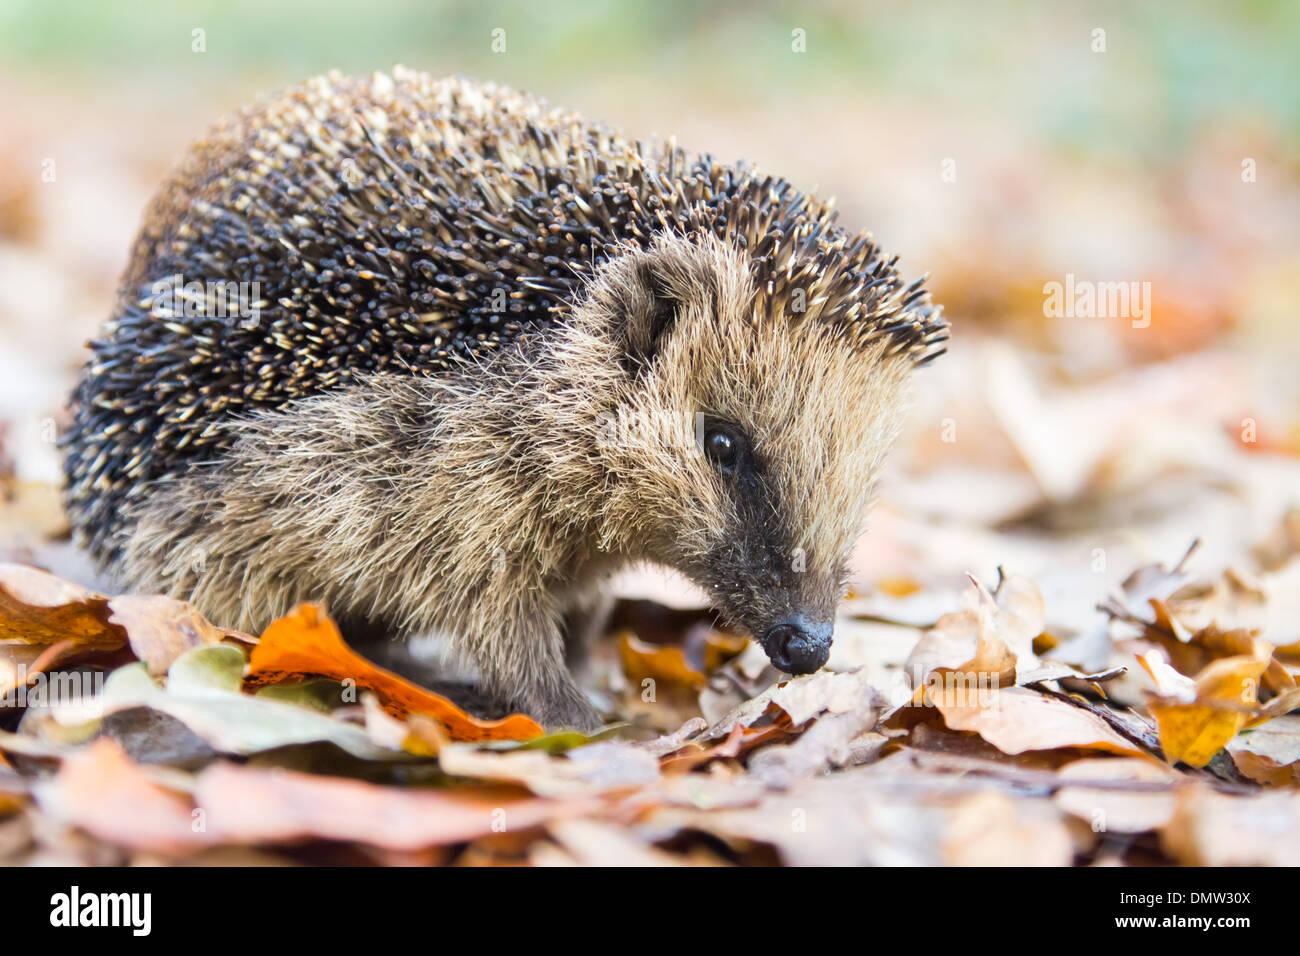 Hedgehog searching between fallen brown leaves in autumn - Stock Image